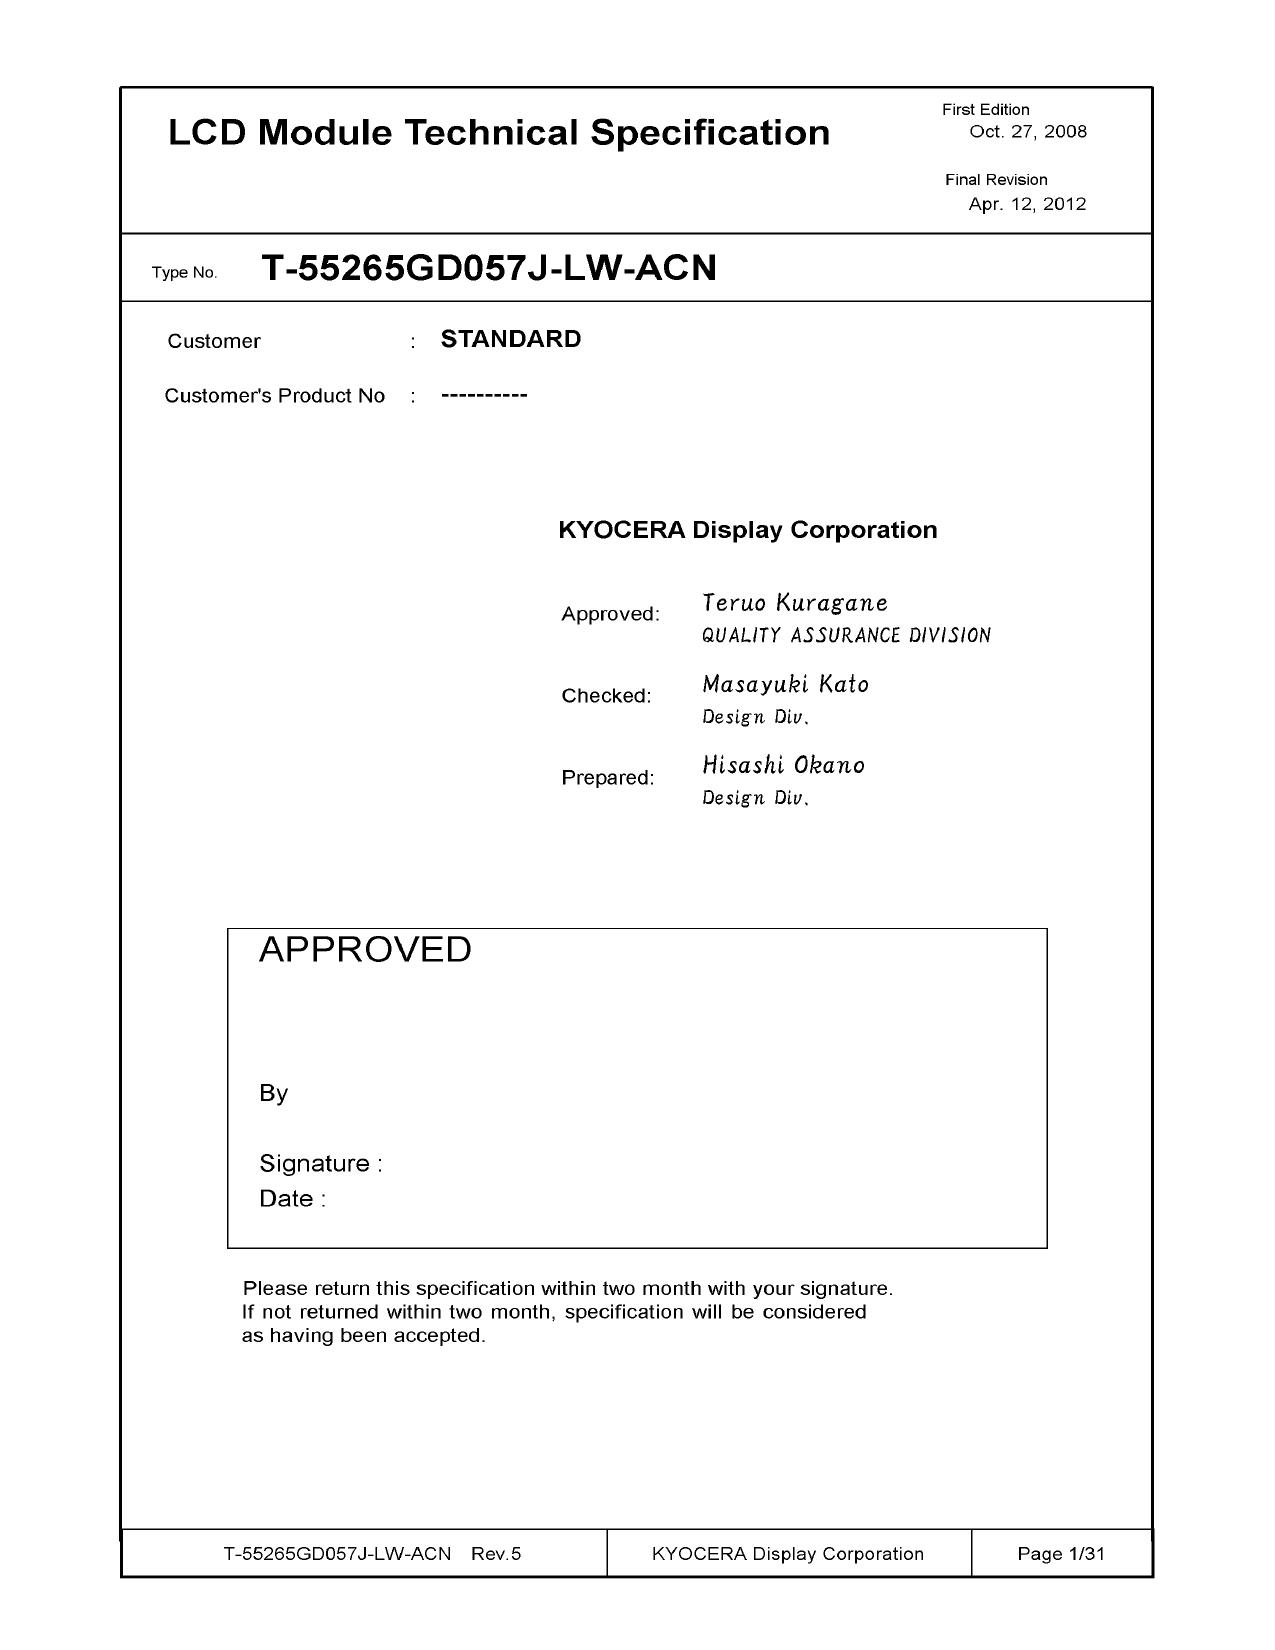 T-55265GD057J-LW-ACN datasheet